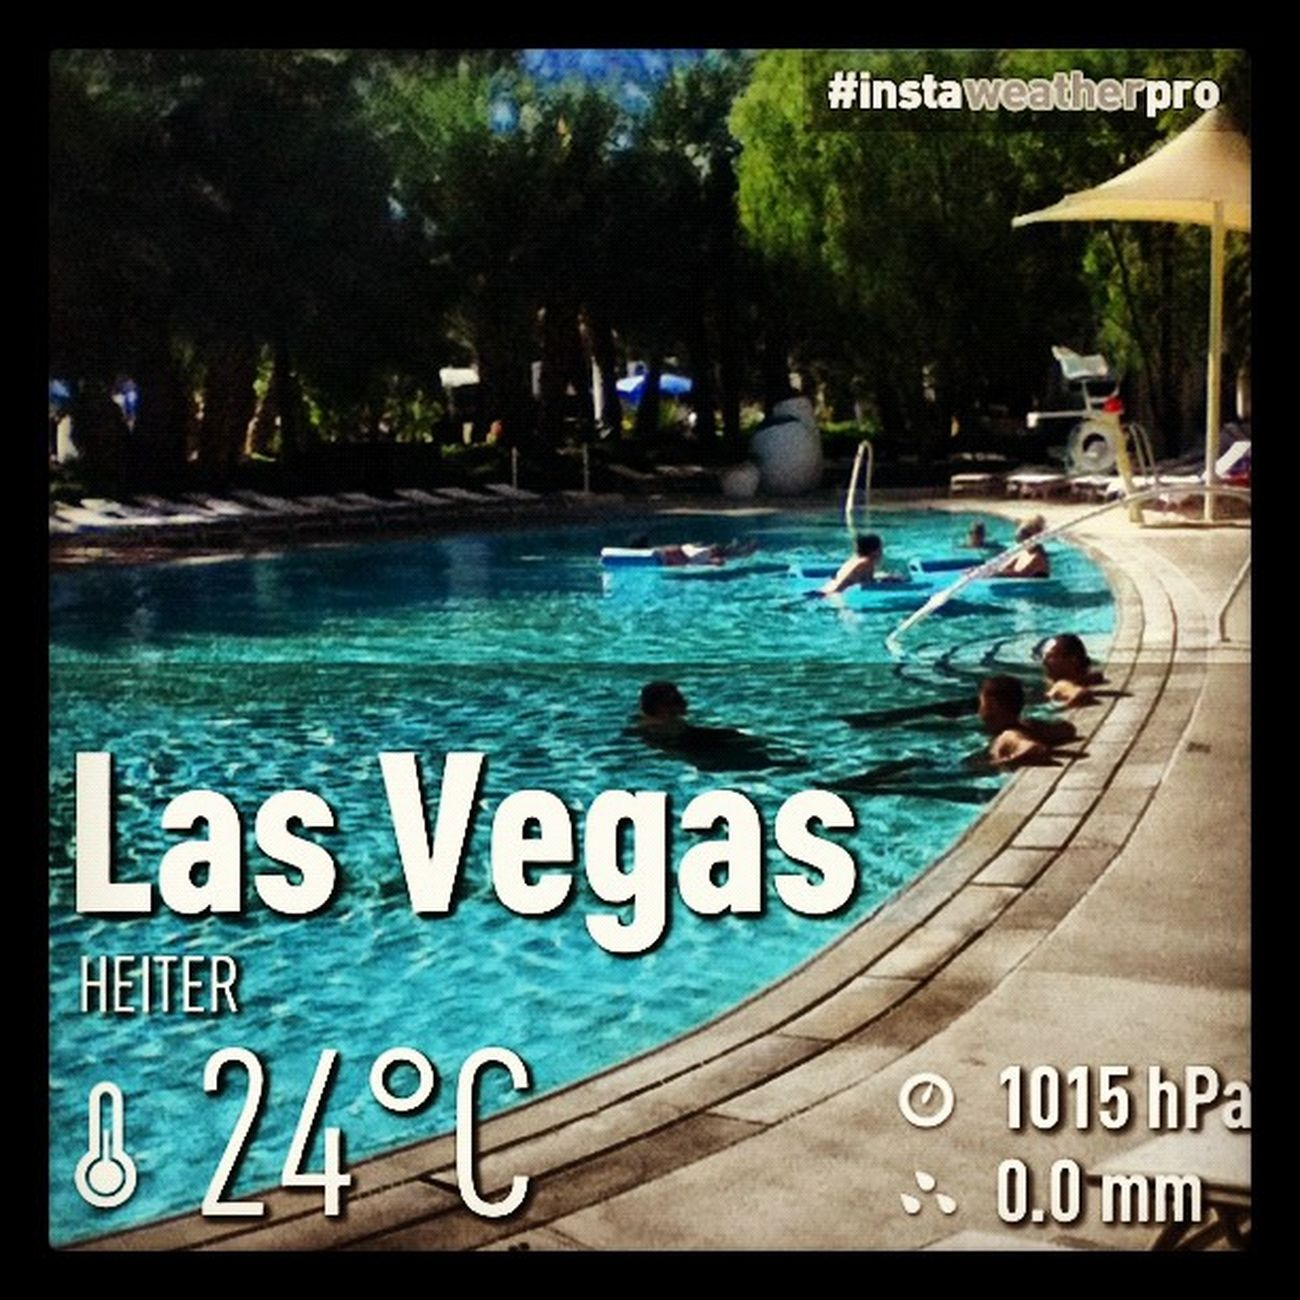 #weather #sky #instaweather #instaweatherpro #Vereinigte Staaten #Las Vegas #ariaresort #pool #usa #lasvegas #honktravel Weather Pool Sky USA Instaweather Instaweatherpro Las Lasvegas Honktravel Vereinigte Ariaresort